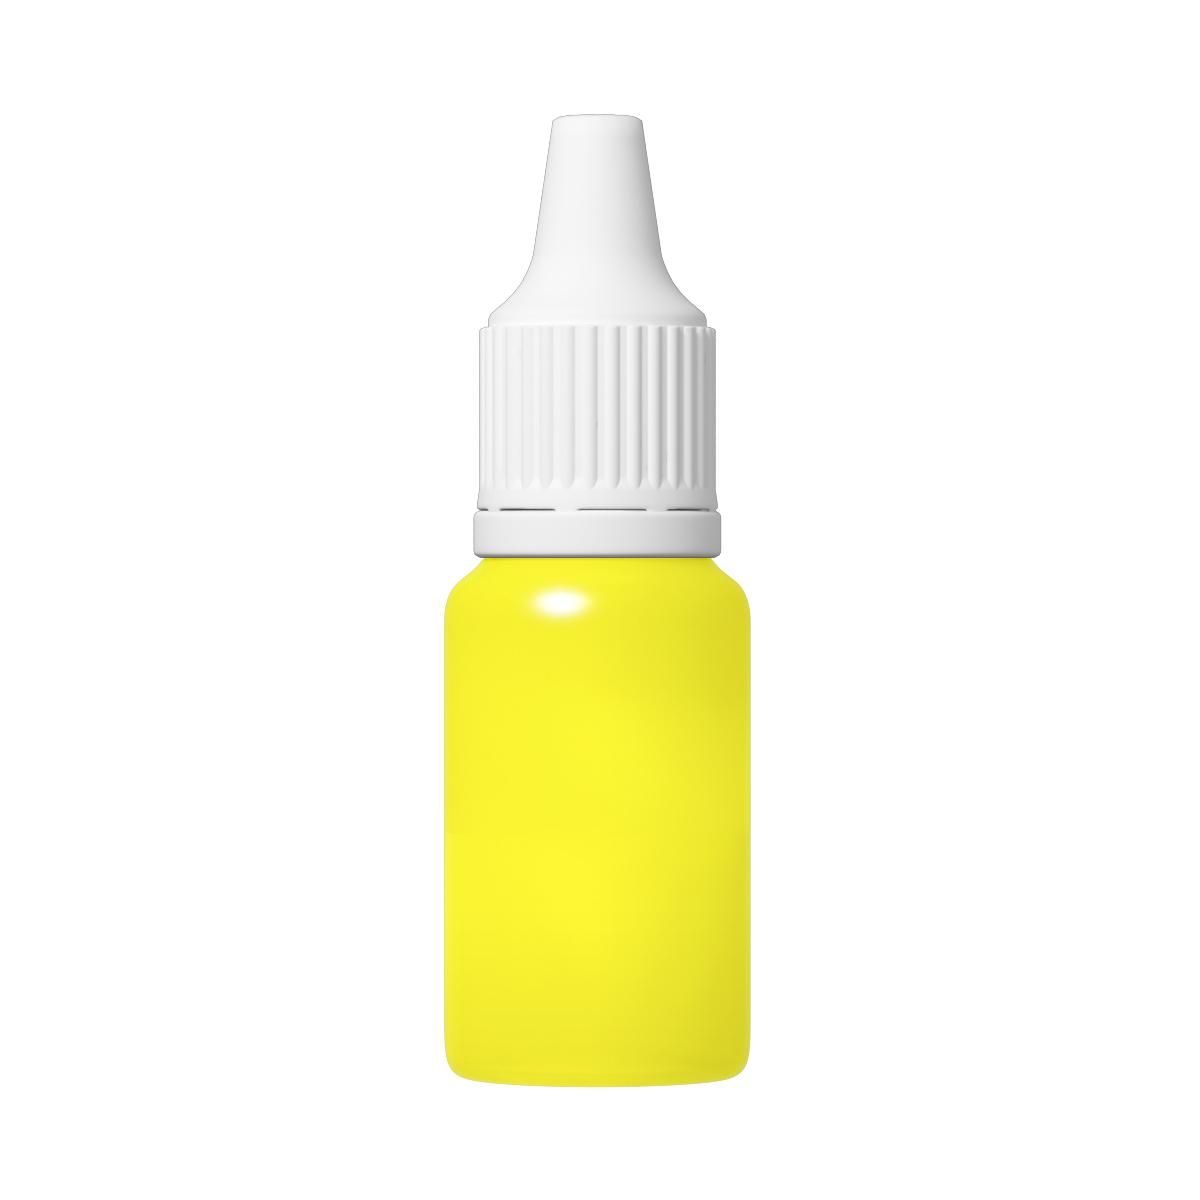 TFC Silikonfarbe Farbpaste Silikon Kautschuk RAL1016 schwefelgelb sulfur yellow